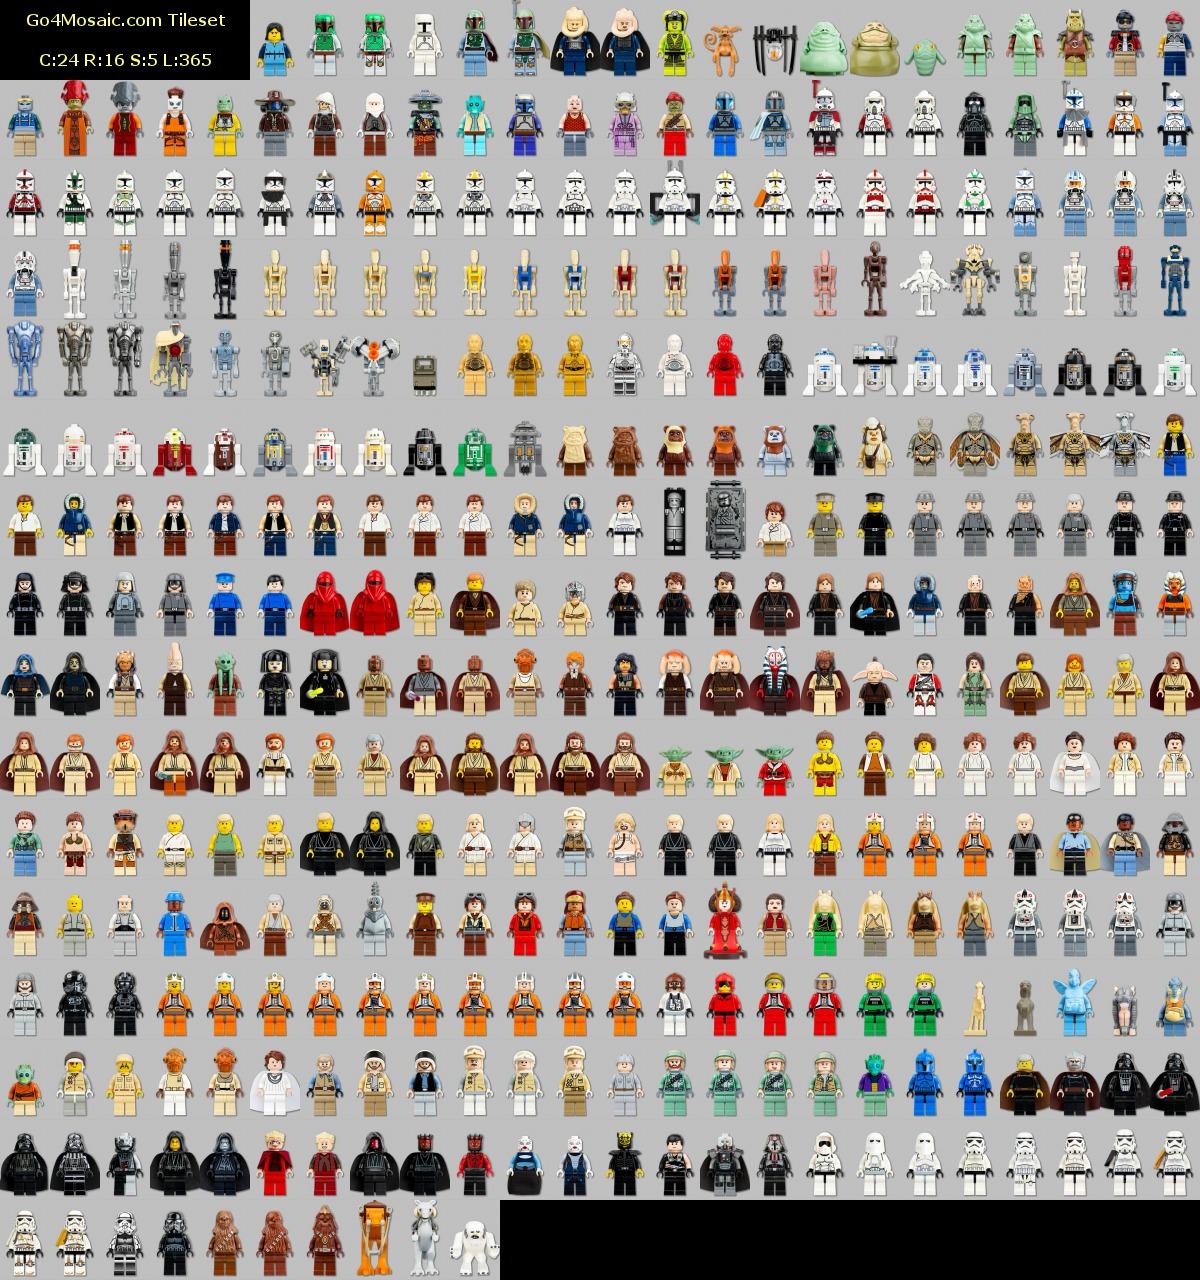 Photo mosaic from Lego Star Wars Figures - Go4mosaic Blog